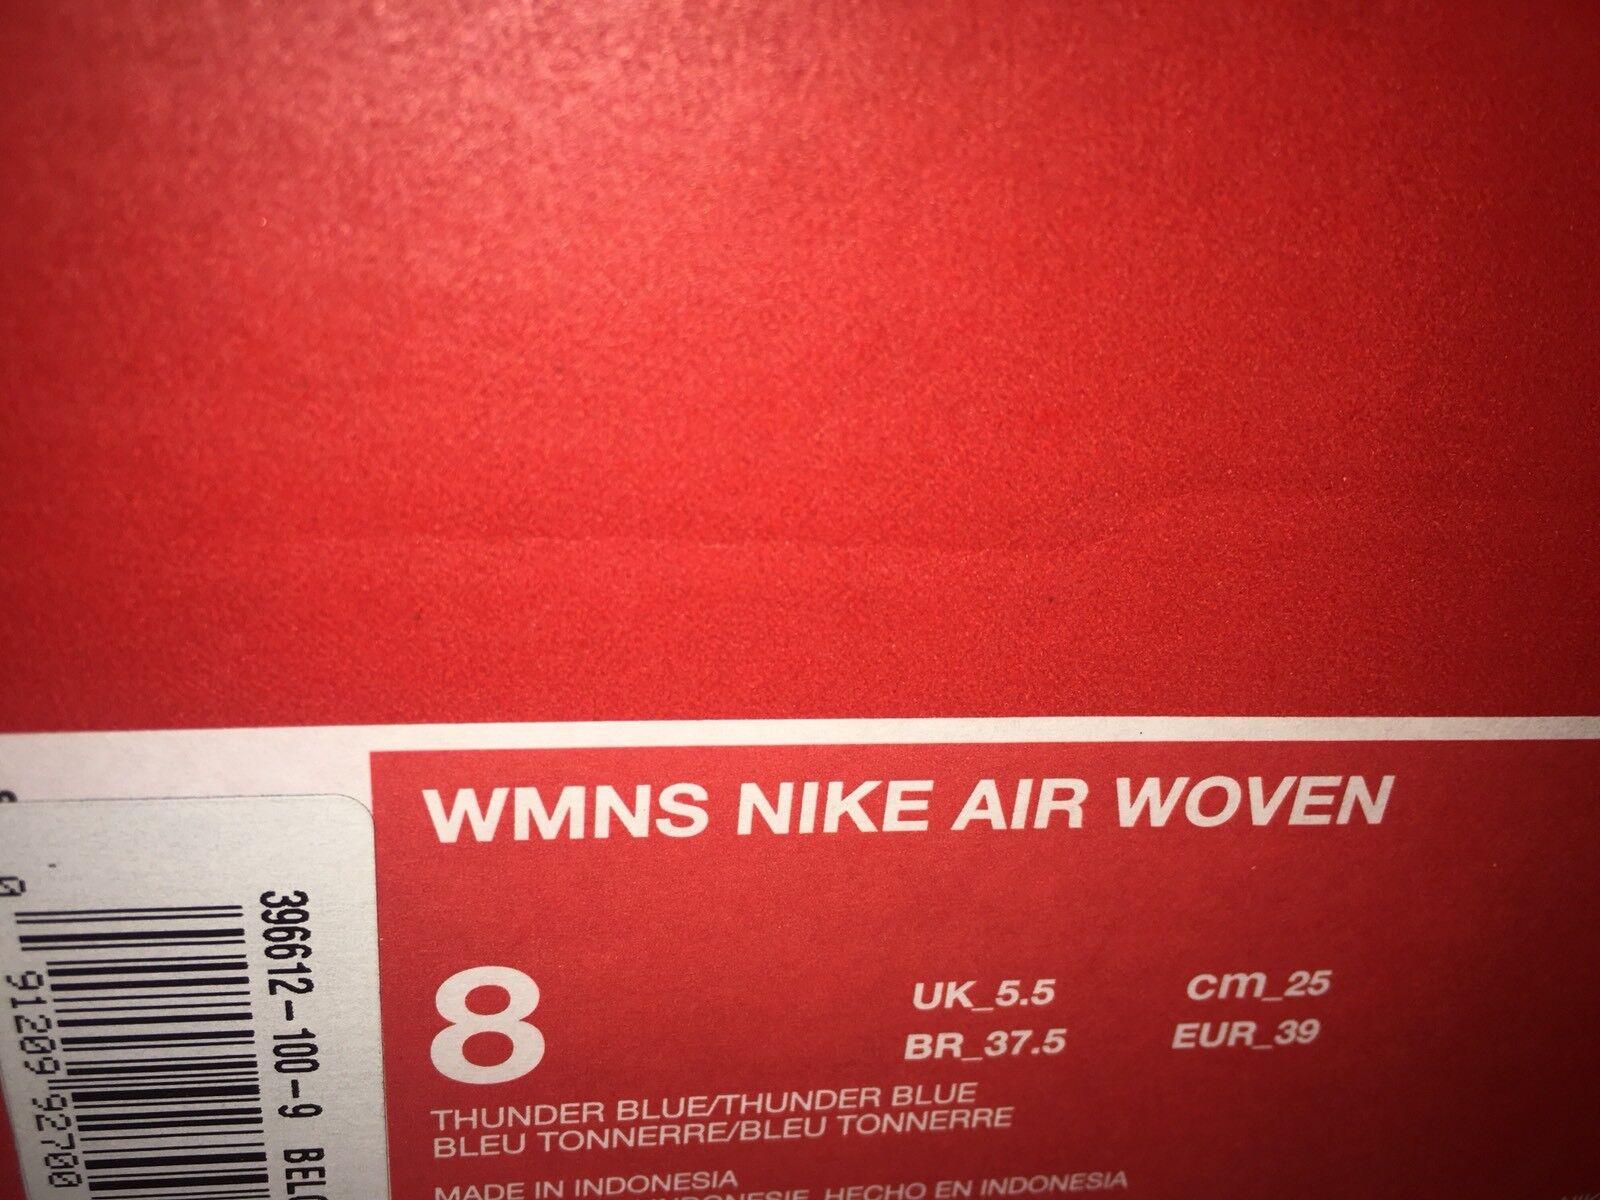 Nike Air Woven Blau Trainers Thunder Blau Woven UK 5.5, EUR 39, US 8, BNIB 60f4ae